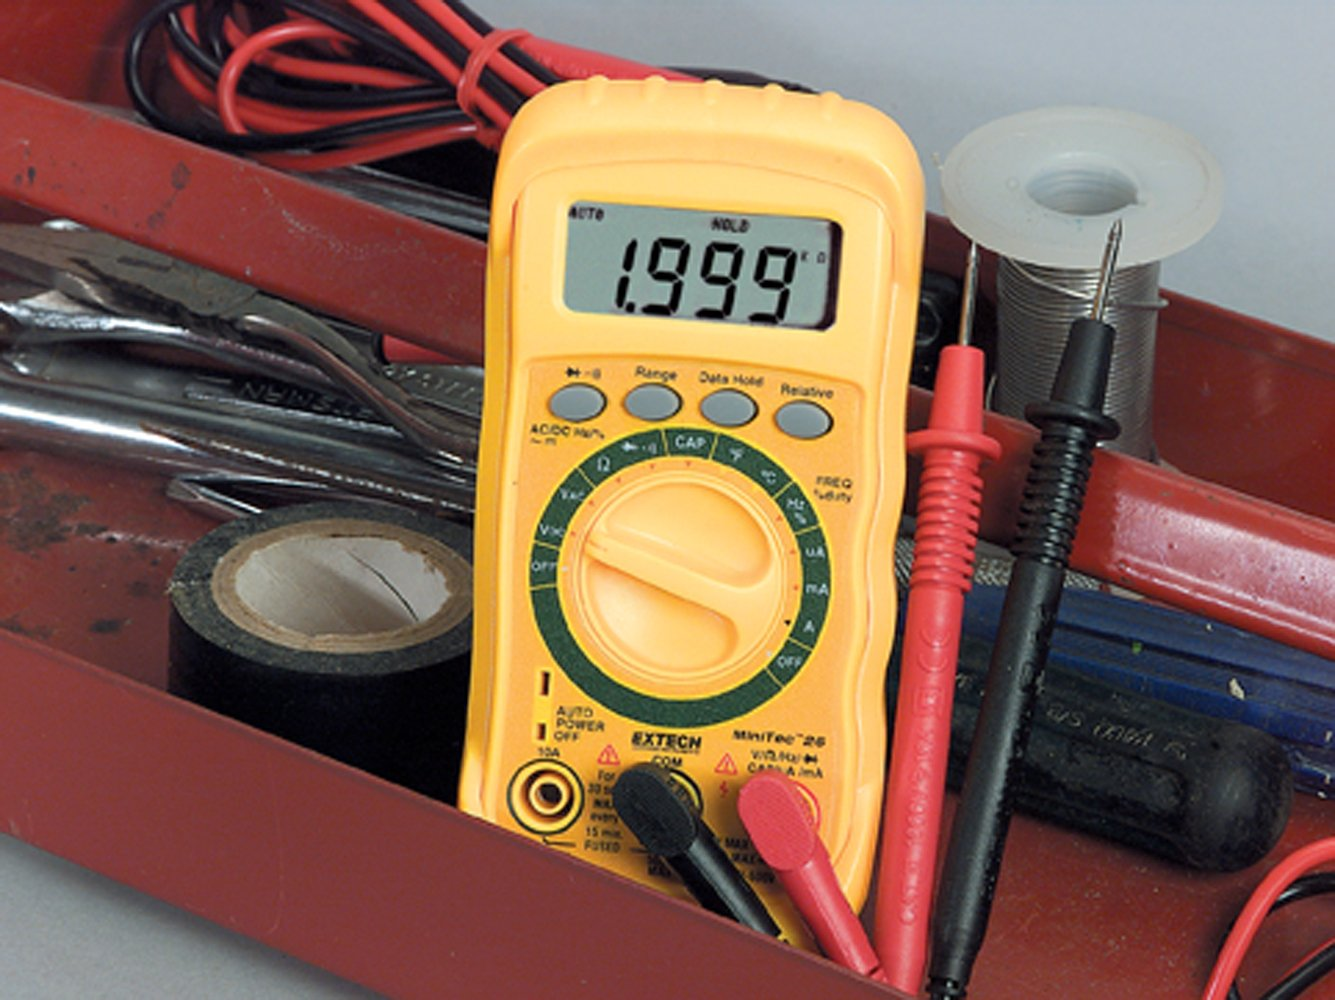 Extech Mn26t Autoranging Multimeter Instruments Corp Ac Circuit Load Tester